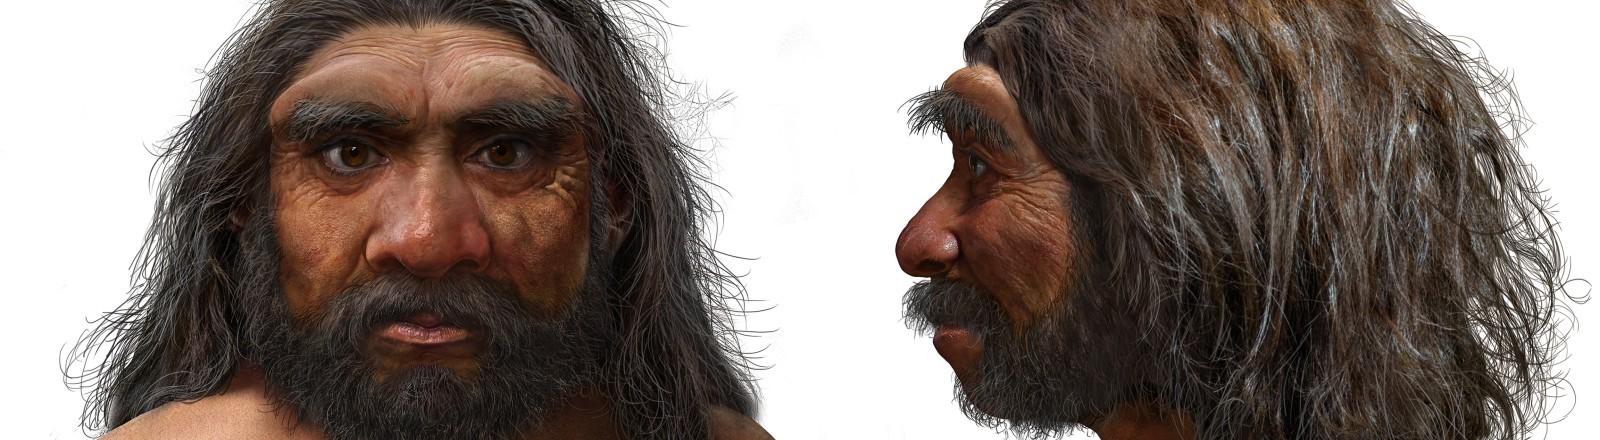 Eine Rekonstruktion des Homo longi.